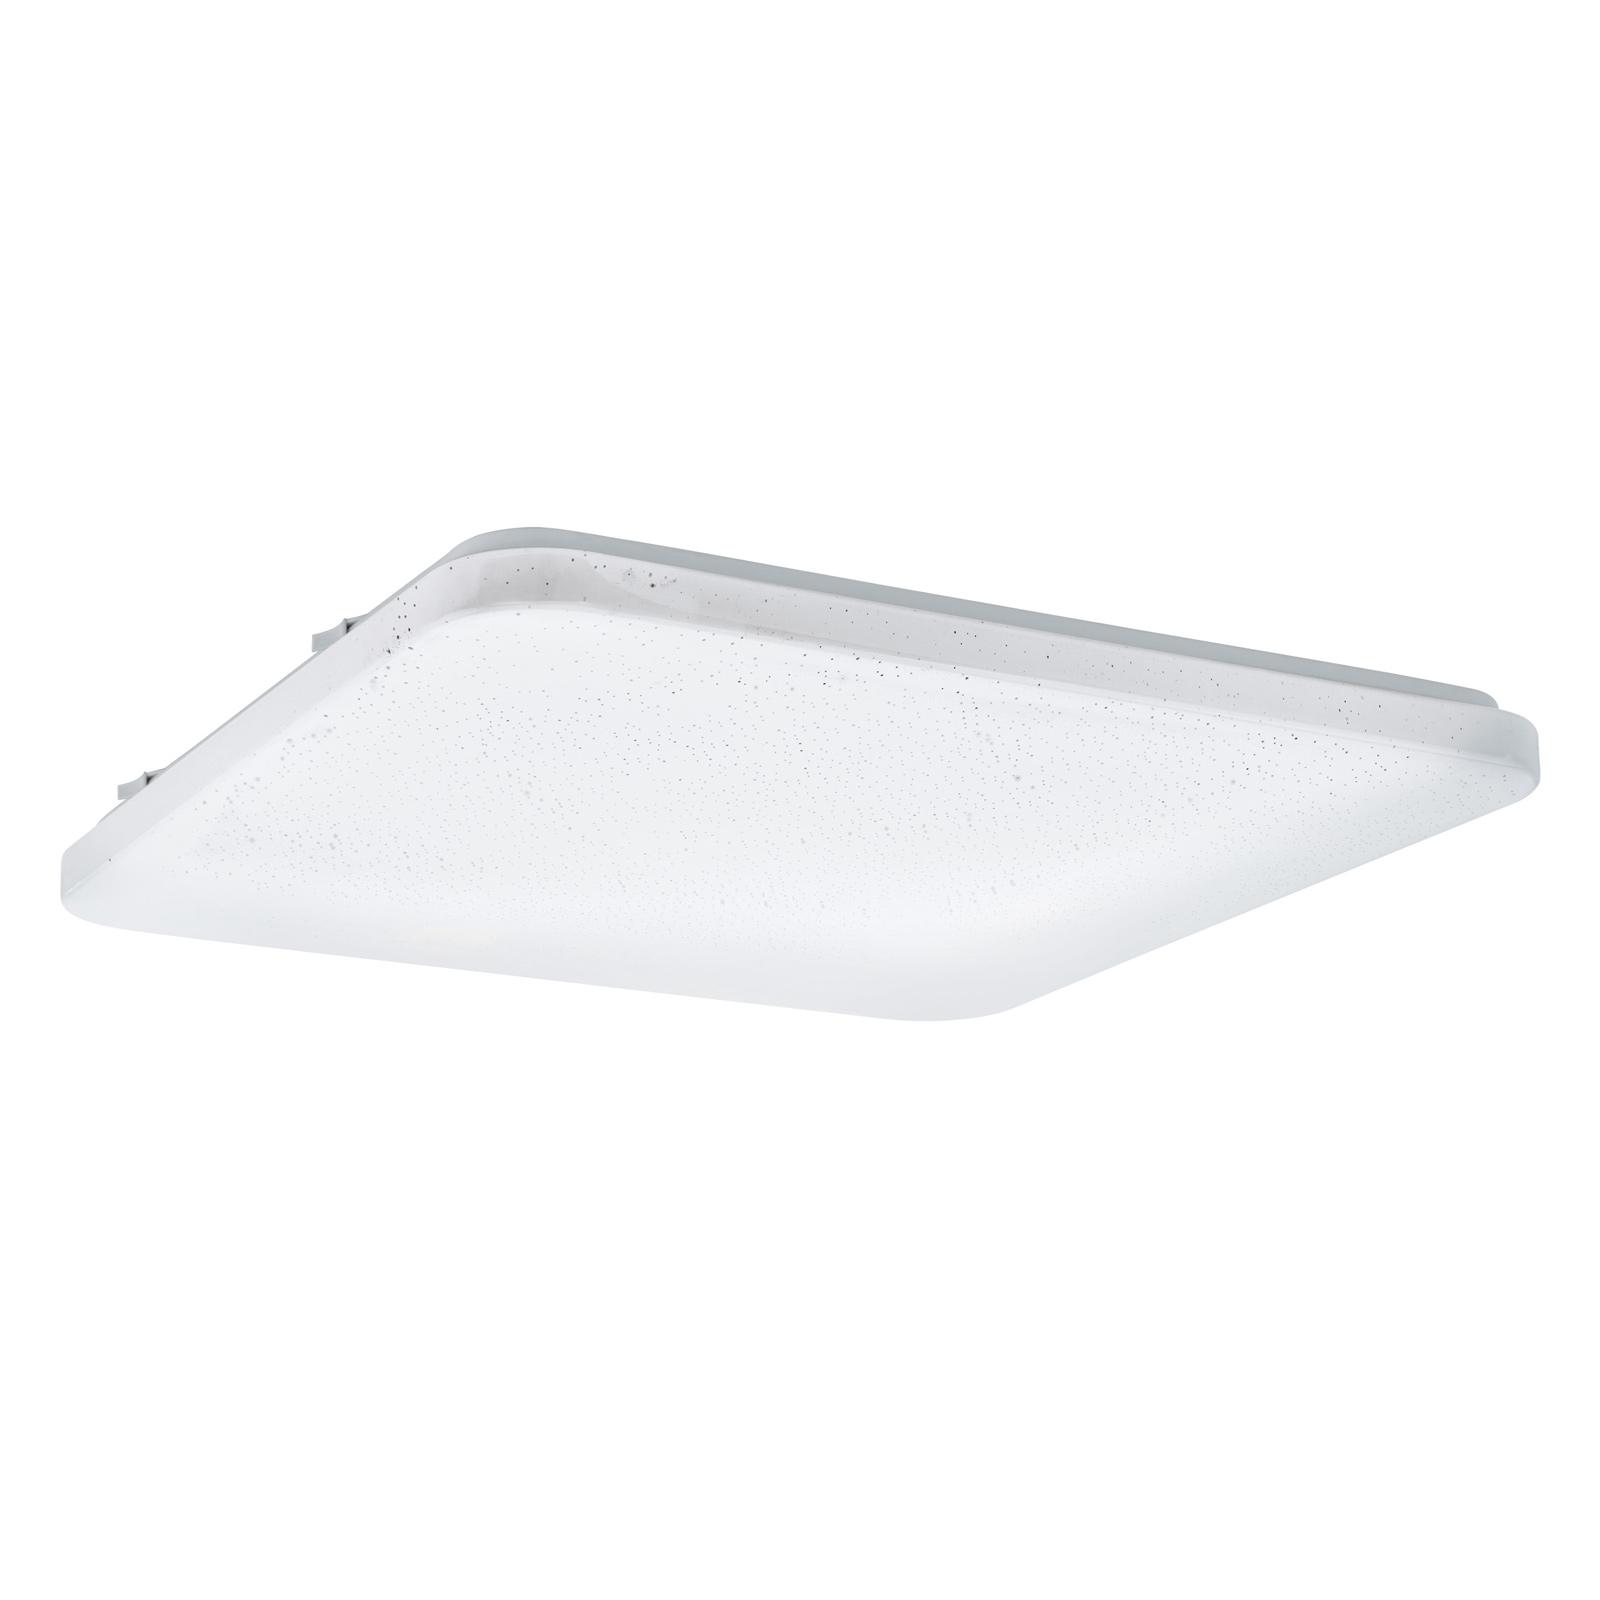 Plafonnier LED Frania effet cristal, angulaire